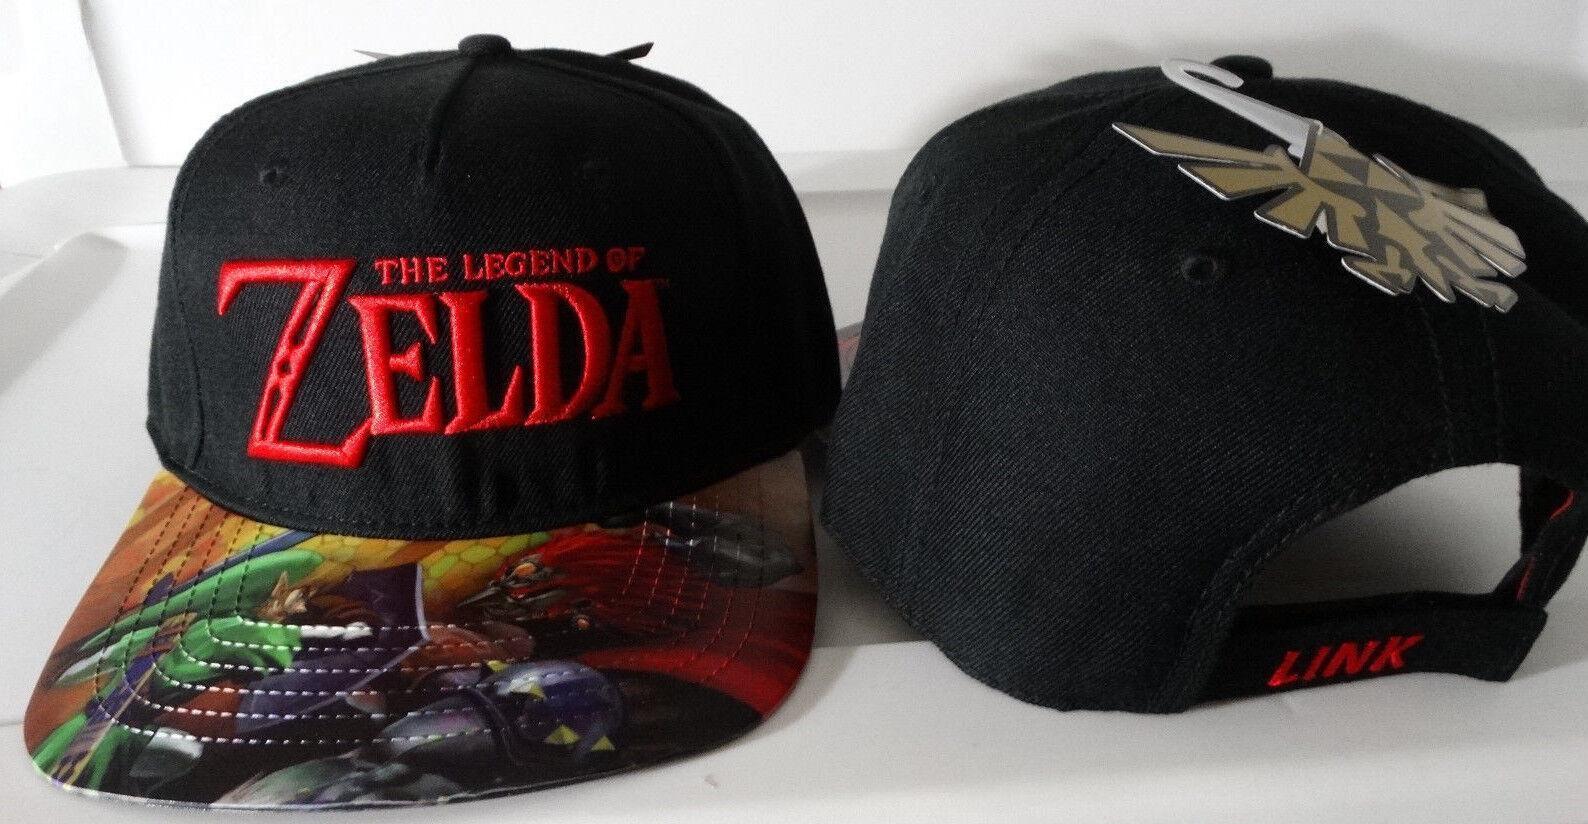 The Legend Vinyl Of Zelda Link Printed Vinyl Legend Bill Nintendo Black Flatbill Hat Nwt cdc934